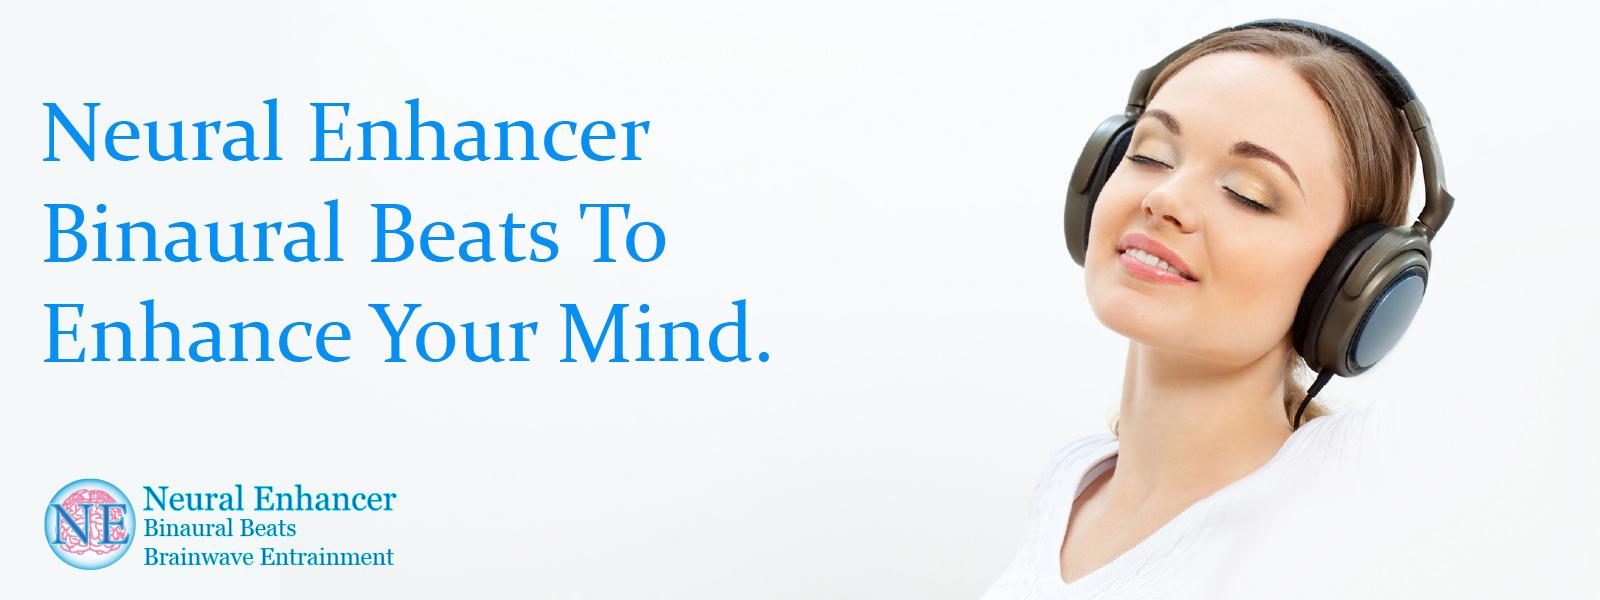 Neural Enhancer Binaural Beats To Enhance Your Mind